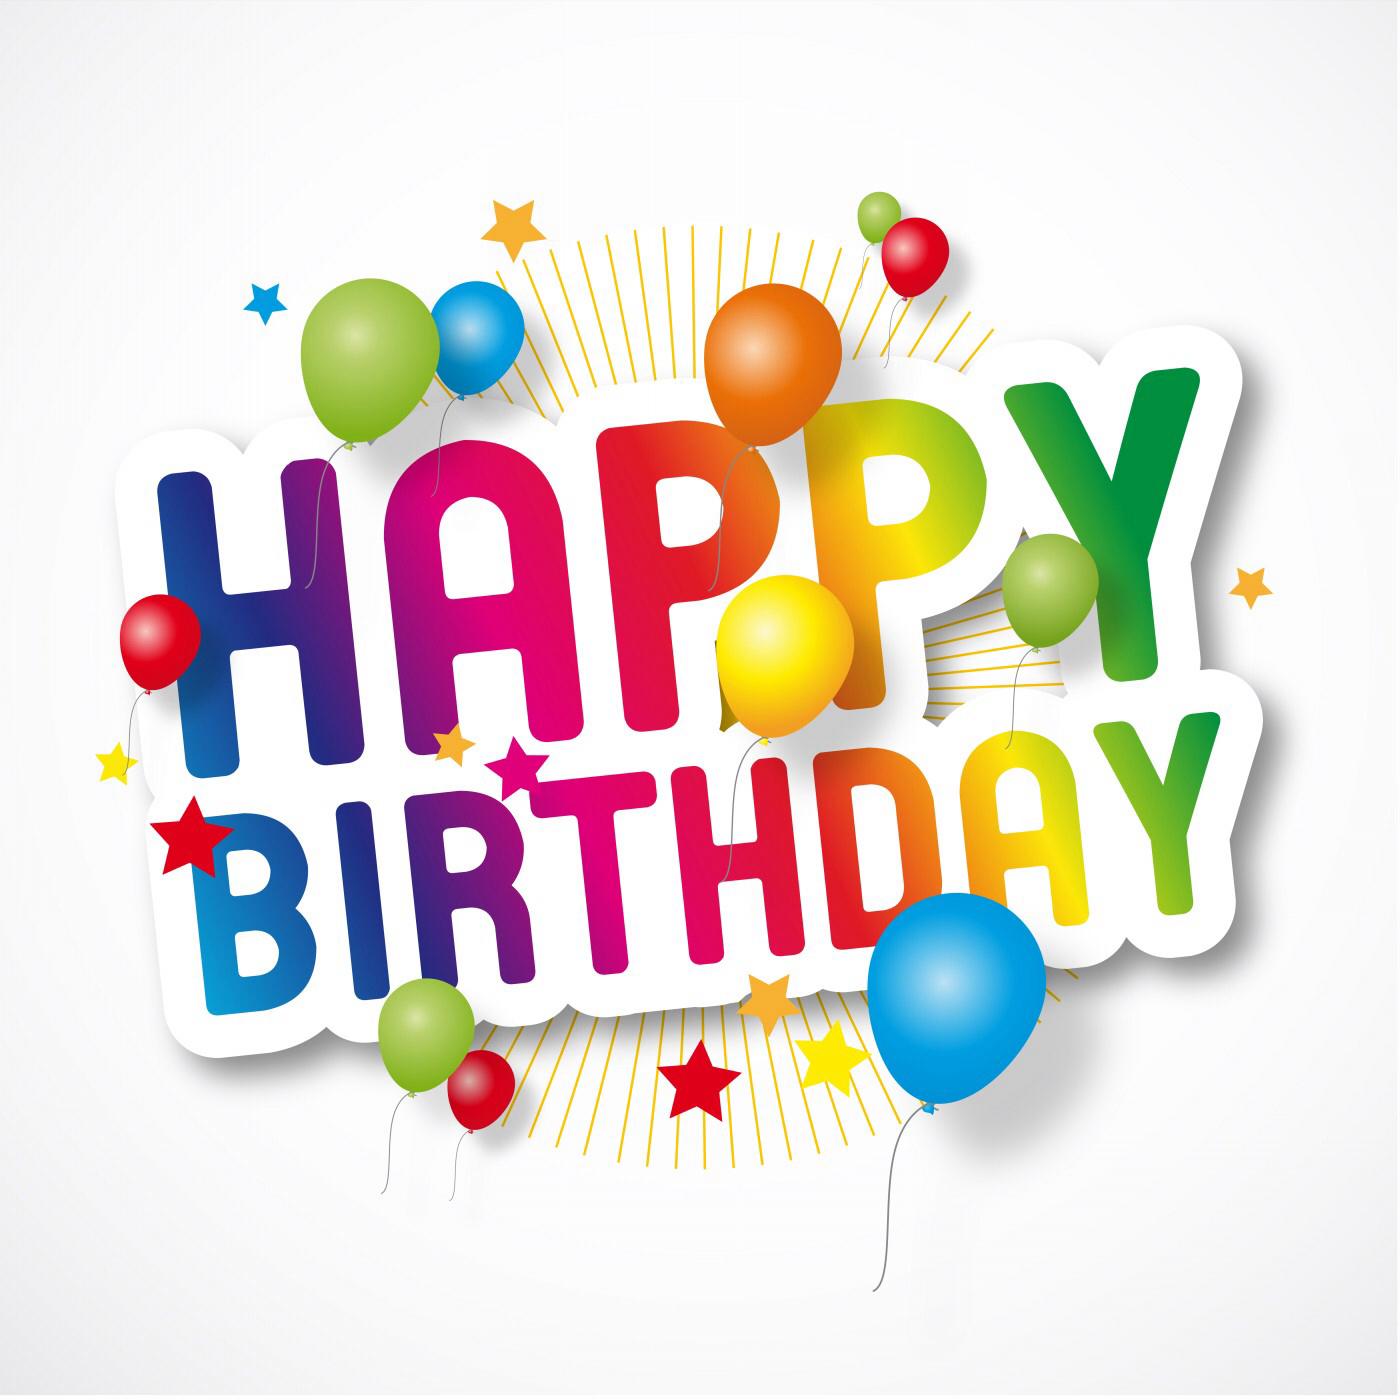 1400x1400 Happy Birthday Allie! Cool Sterff Clip Art